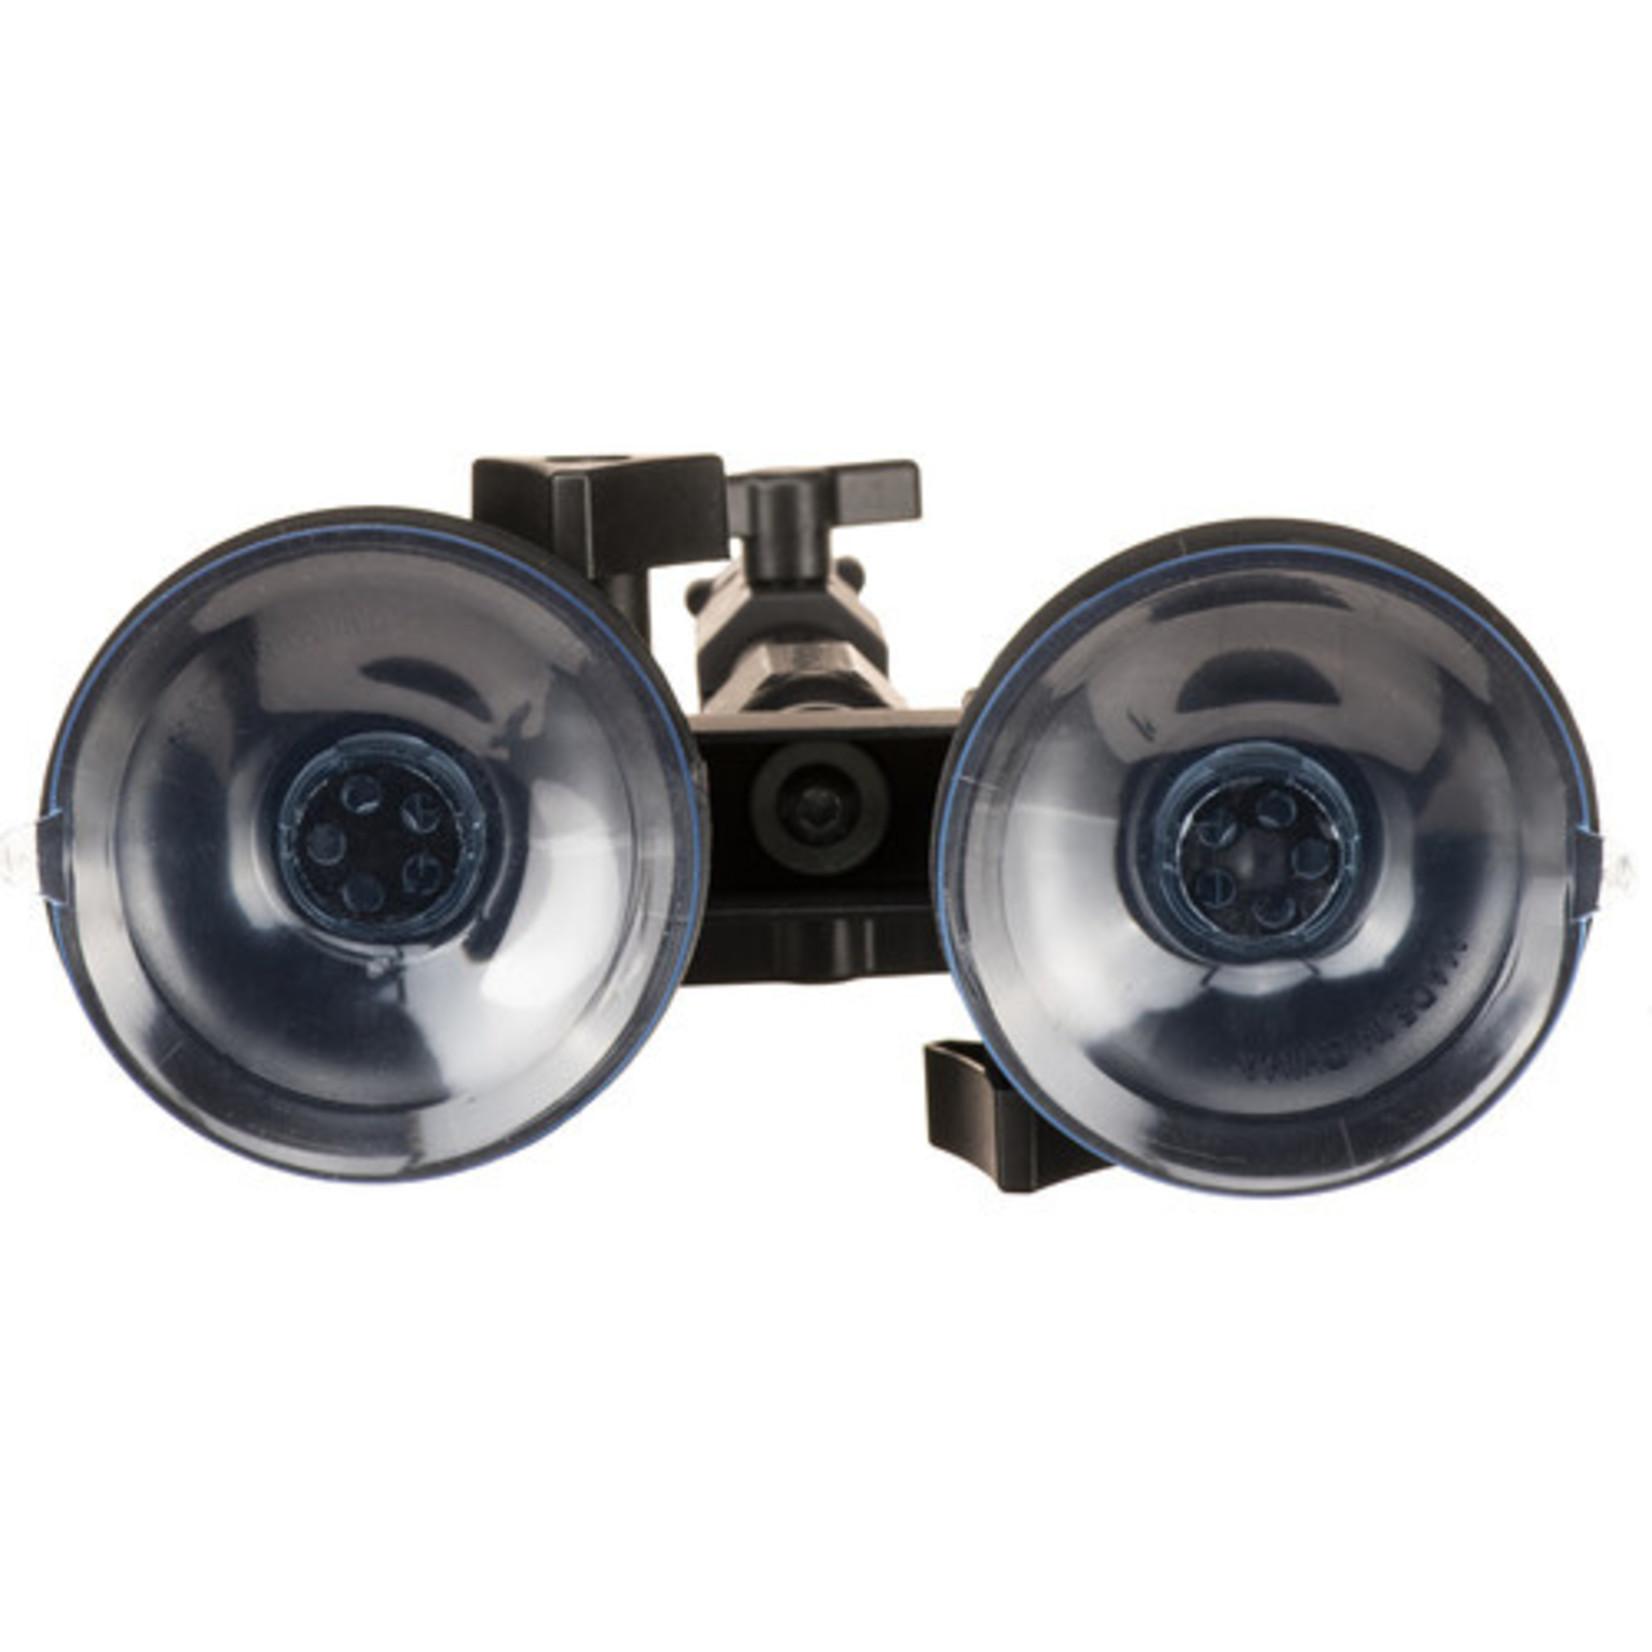 Delkin Fat Gecko Dual-Suction Camera Mount